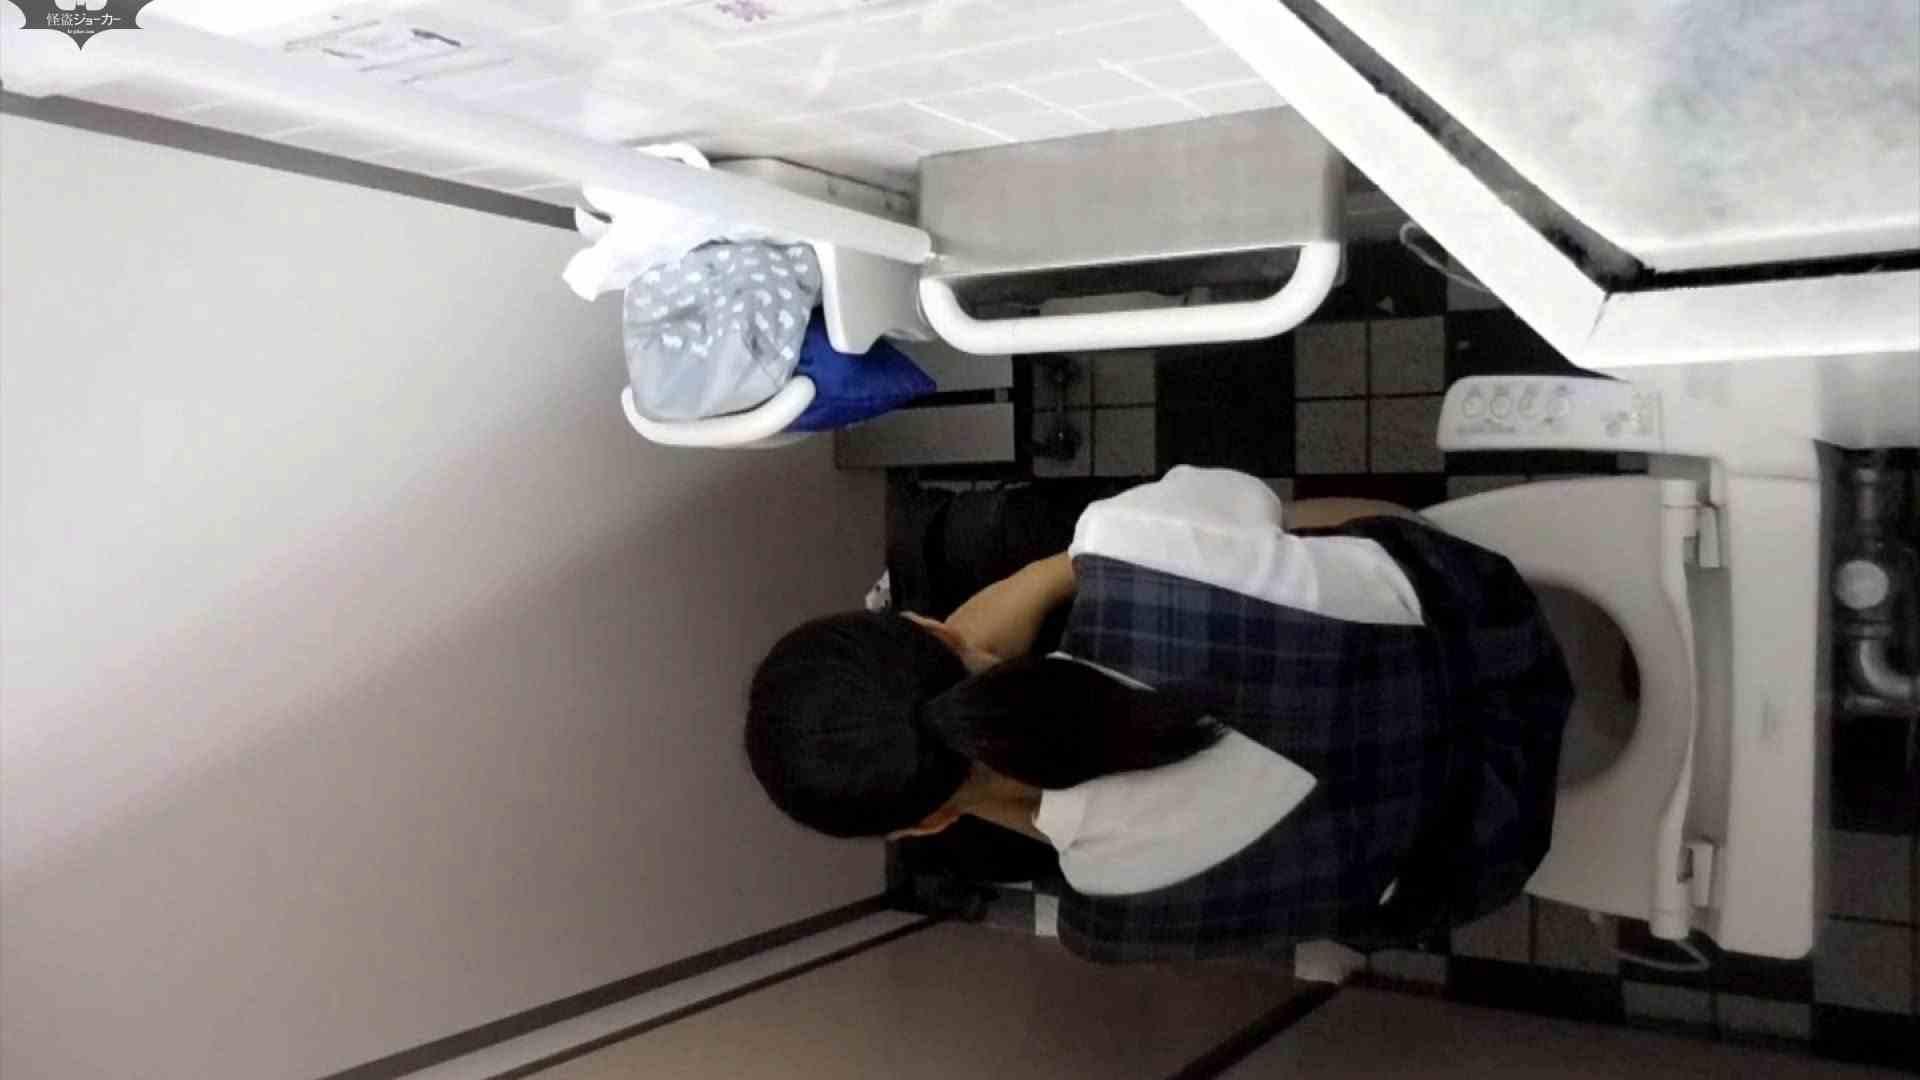 化粧室絵巻 駅舎編 VOL.26 隠れた名作 エロ無料画像 90画像 39